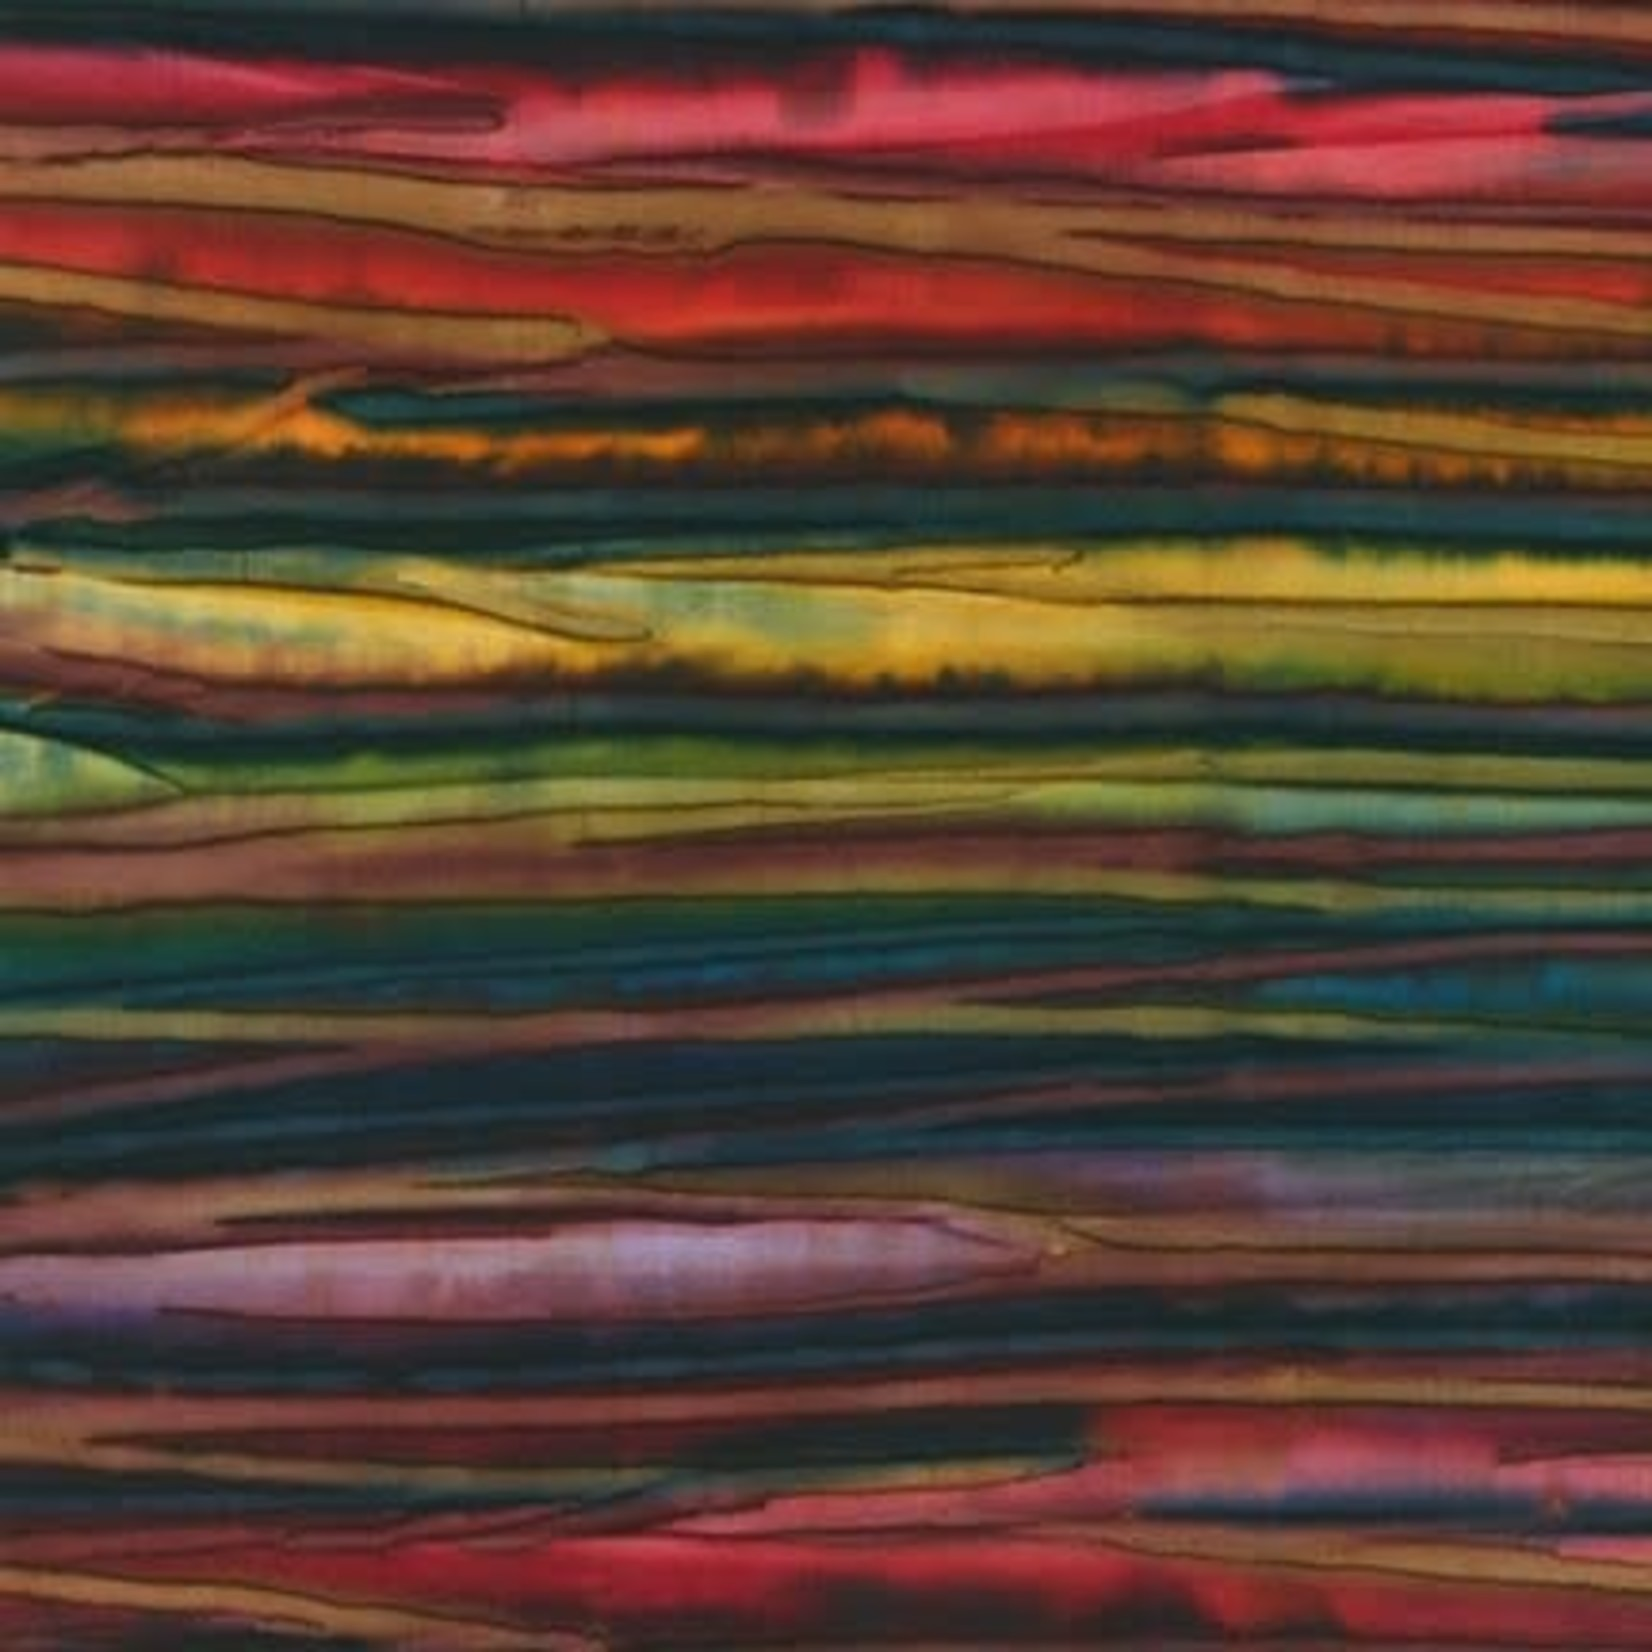 ROBERT KAUFMAN ARTISANS BATIKS, PATINA HAND PAINTS, WILD, 20068-286-17 Per Cm or $20/m